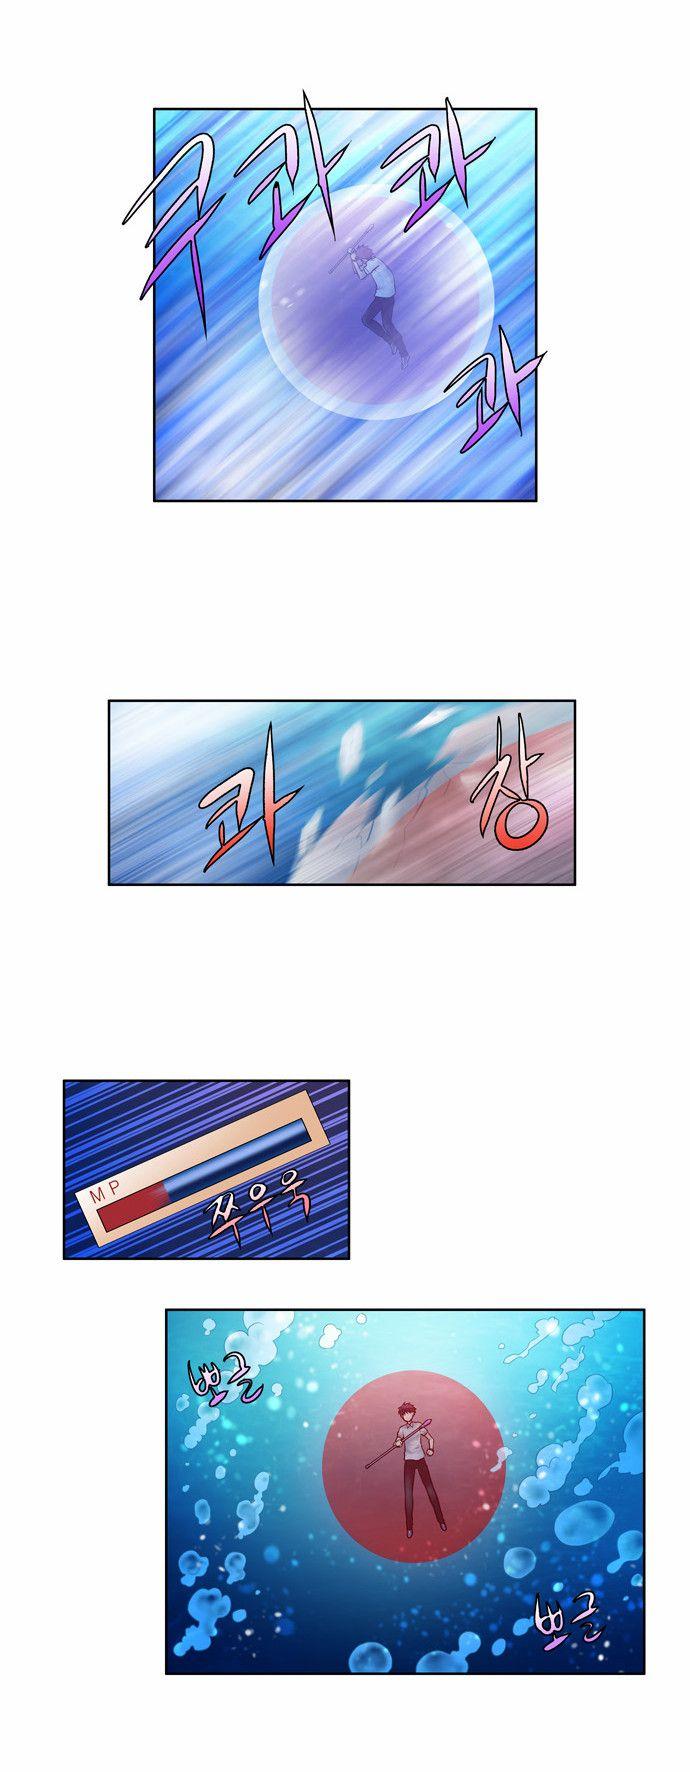 https://c5.ninemanga.com/es_manga/pic2/61/1725/502851/70d824bfb41b6e2f1a3358a7d09b8910.jpg Page 3